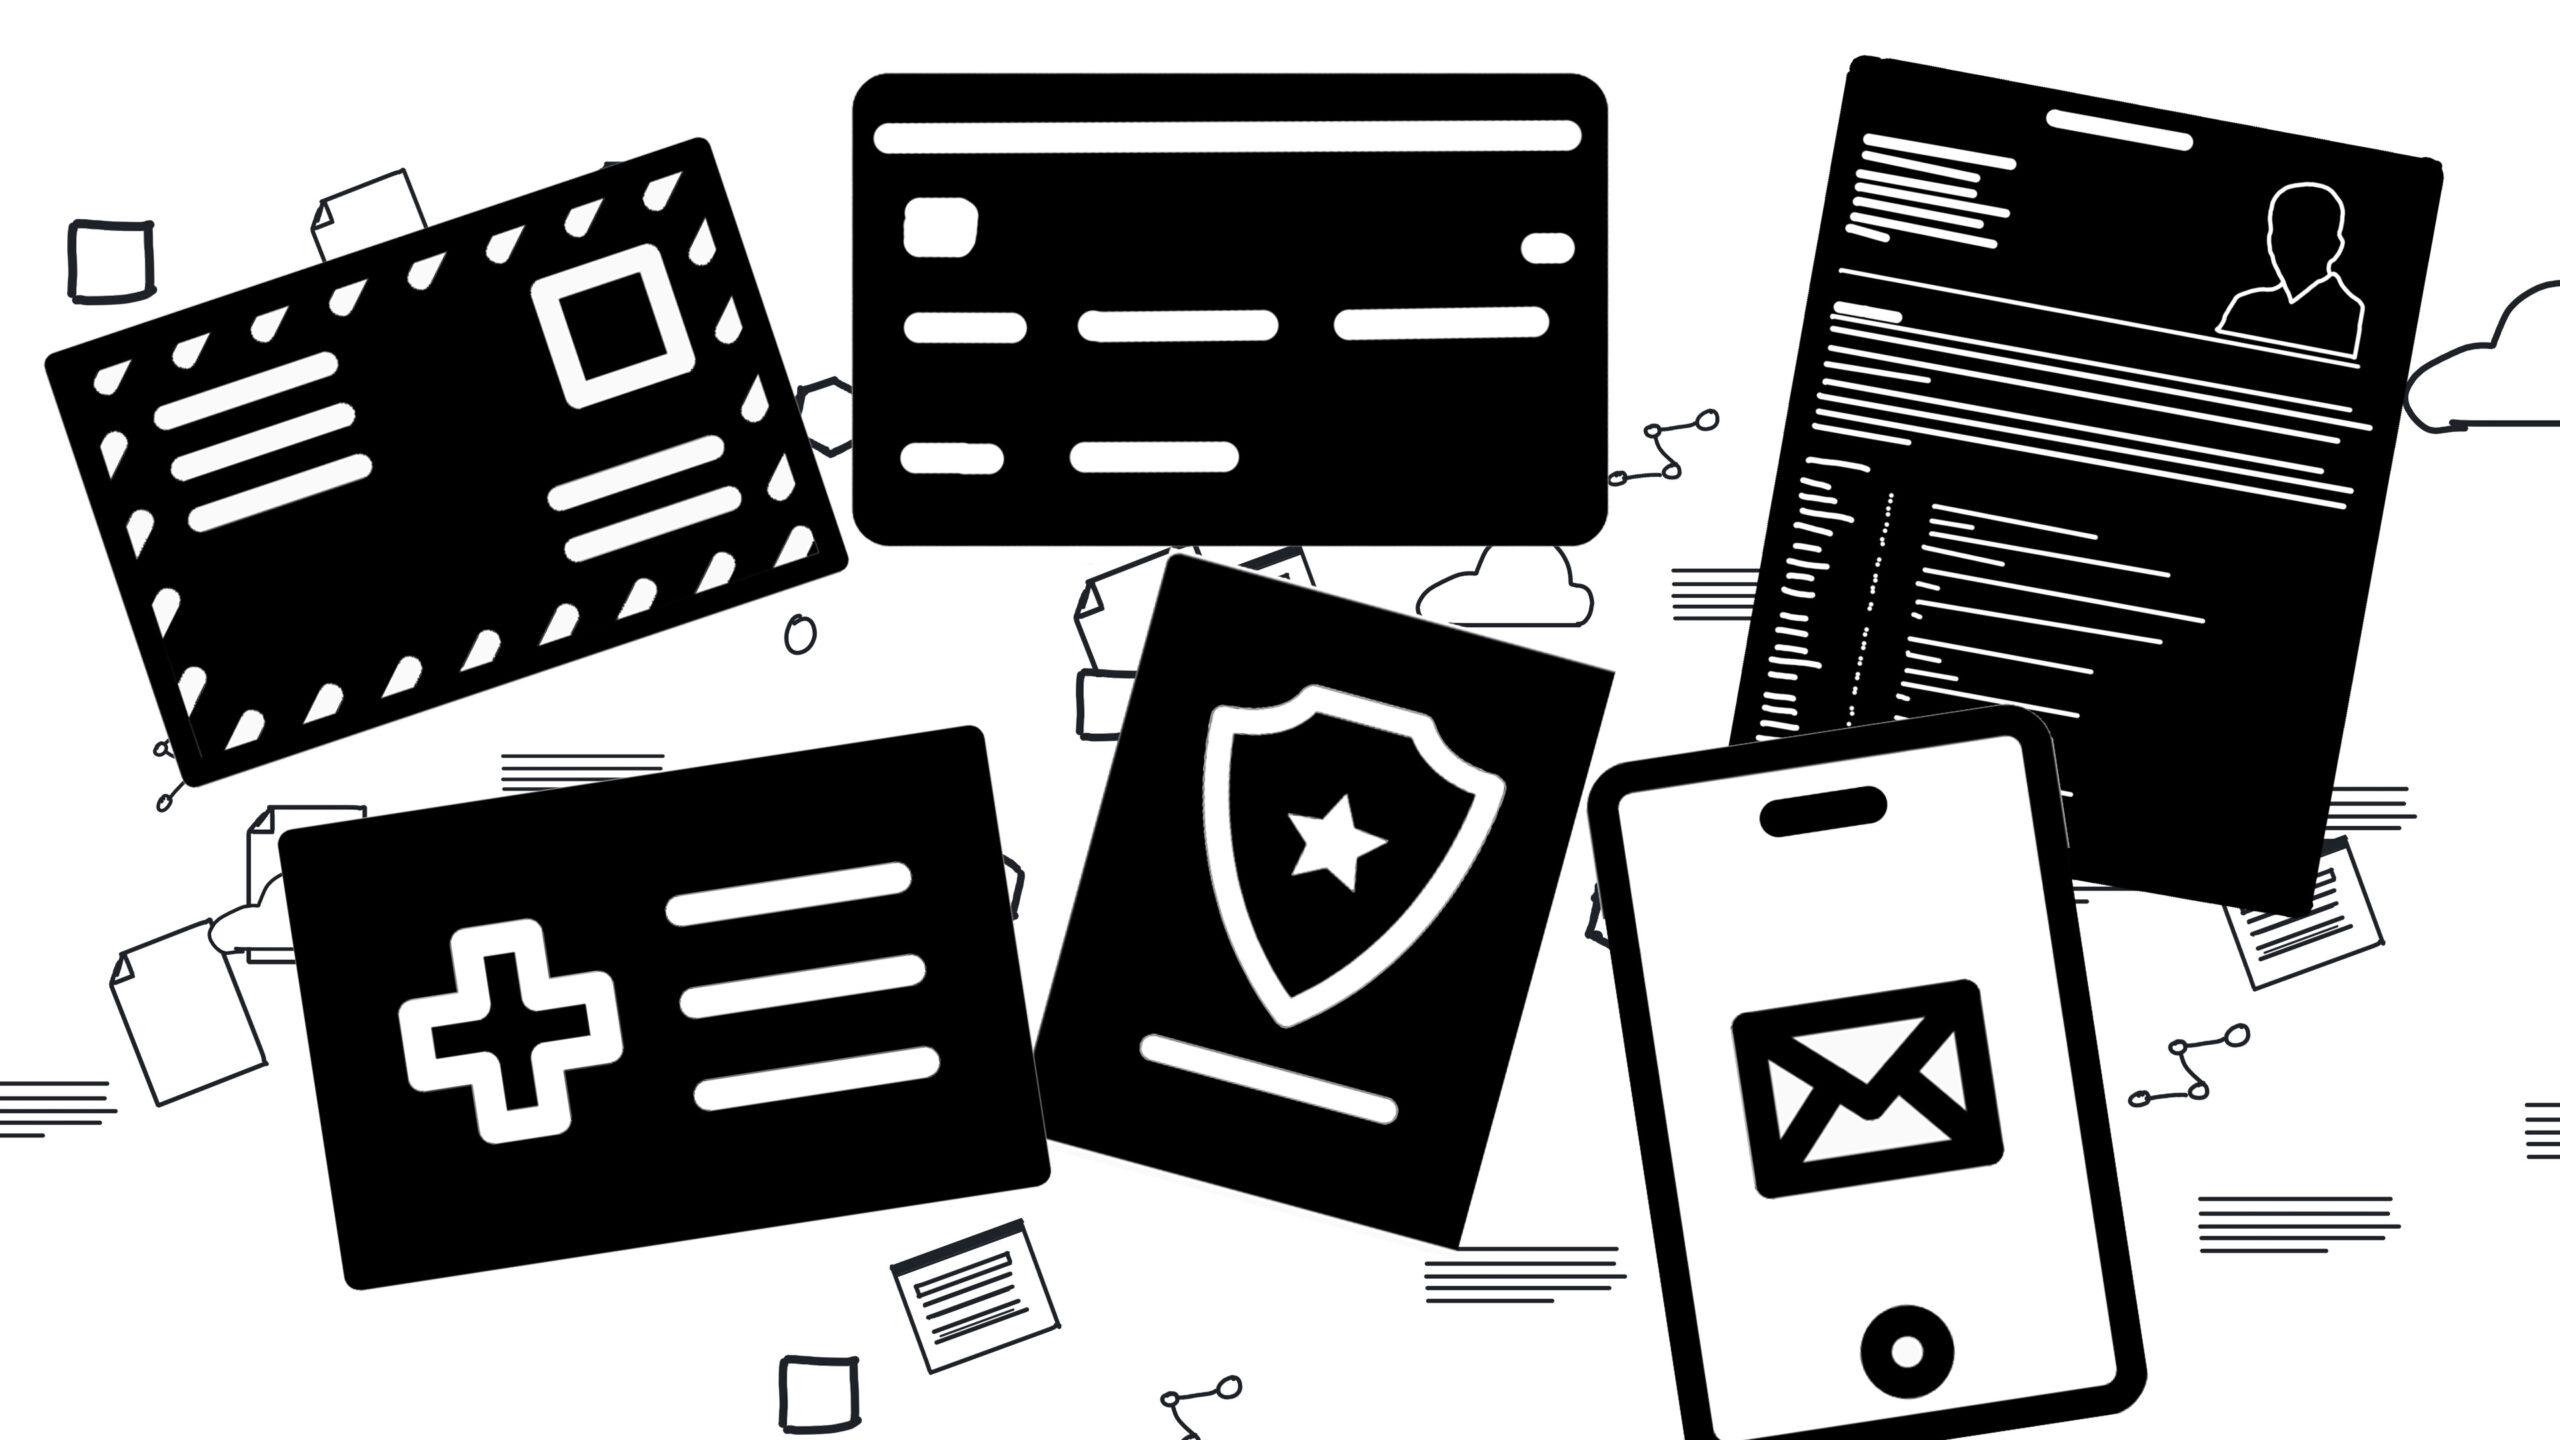 Privacy_Incident_Sketchboard_0302